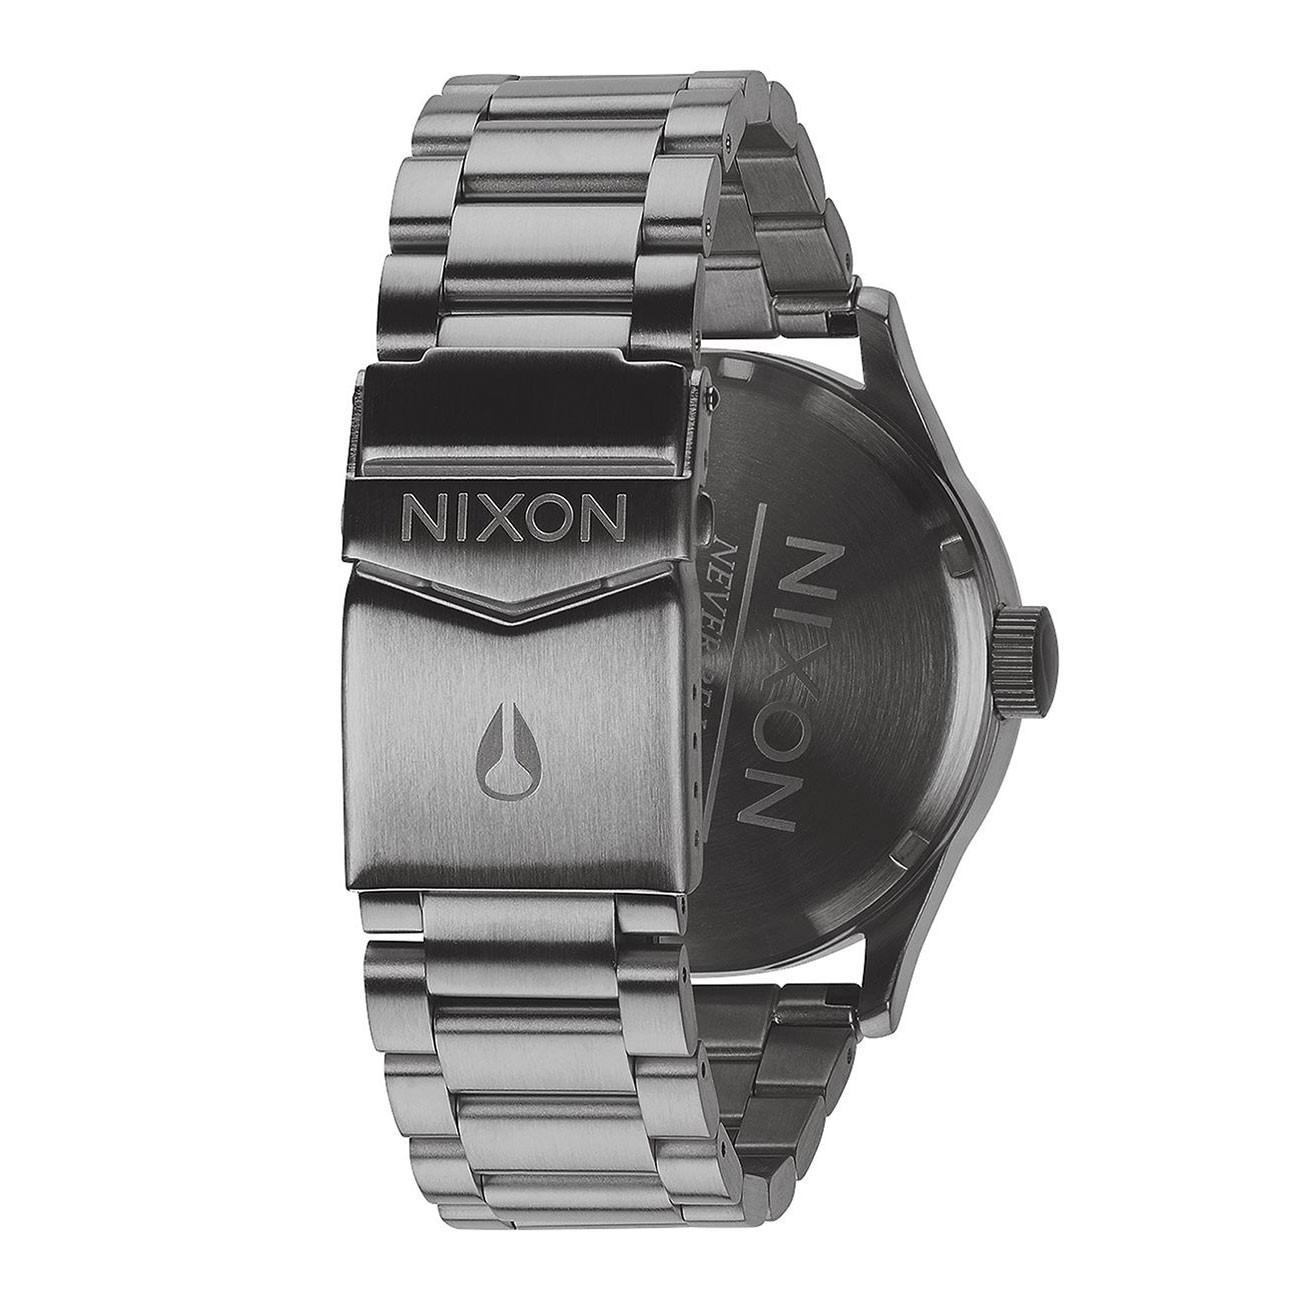 47357eac027 Watch nixon sentry gunmetal green oxyde snowboard zezula jpg 1300x1300 Sentry  gunmetal nixon